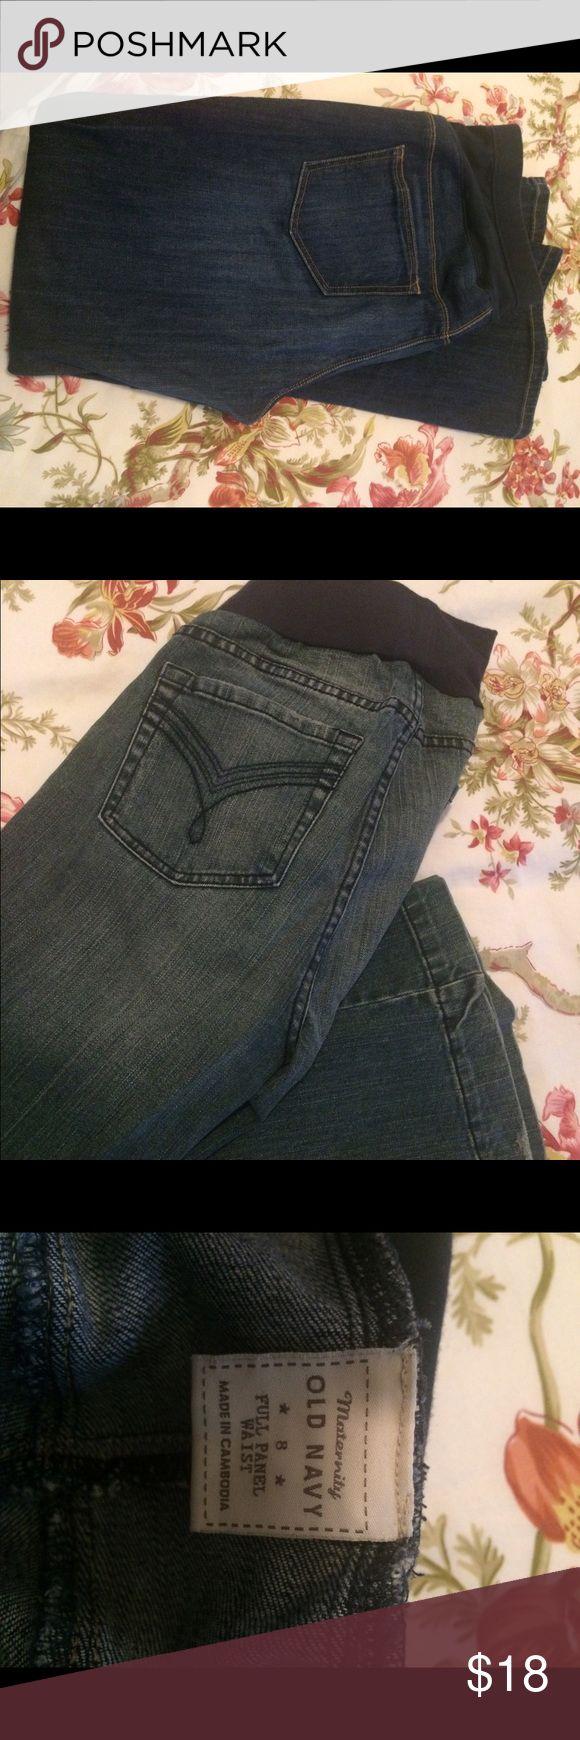 "Old Navy Maternity Jeans My favorite maternity jeans!  Boot cut, dark wash, 31"" inseam maternity jeans from Old Navy. Old Navy Jeans Boot Cut"